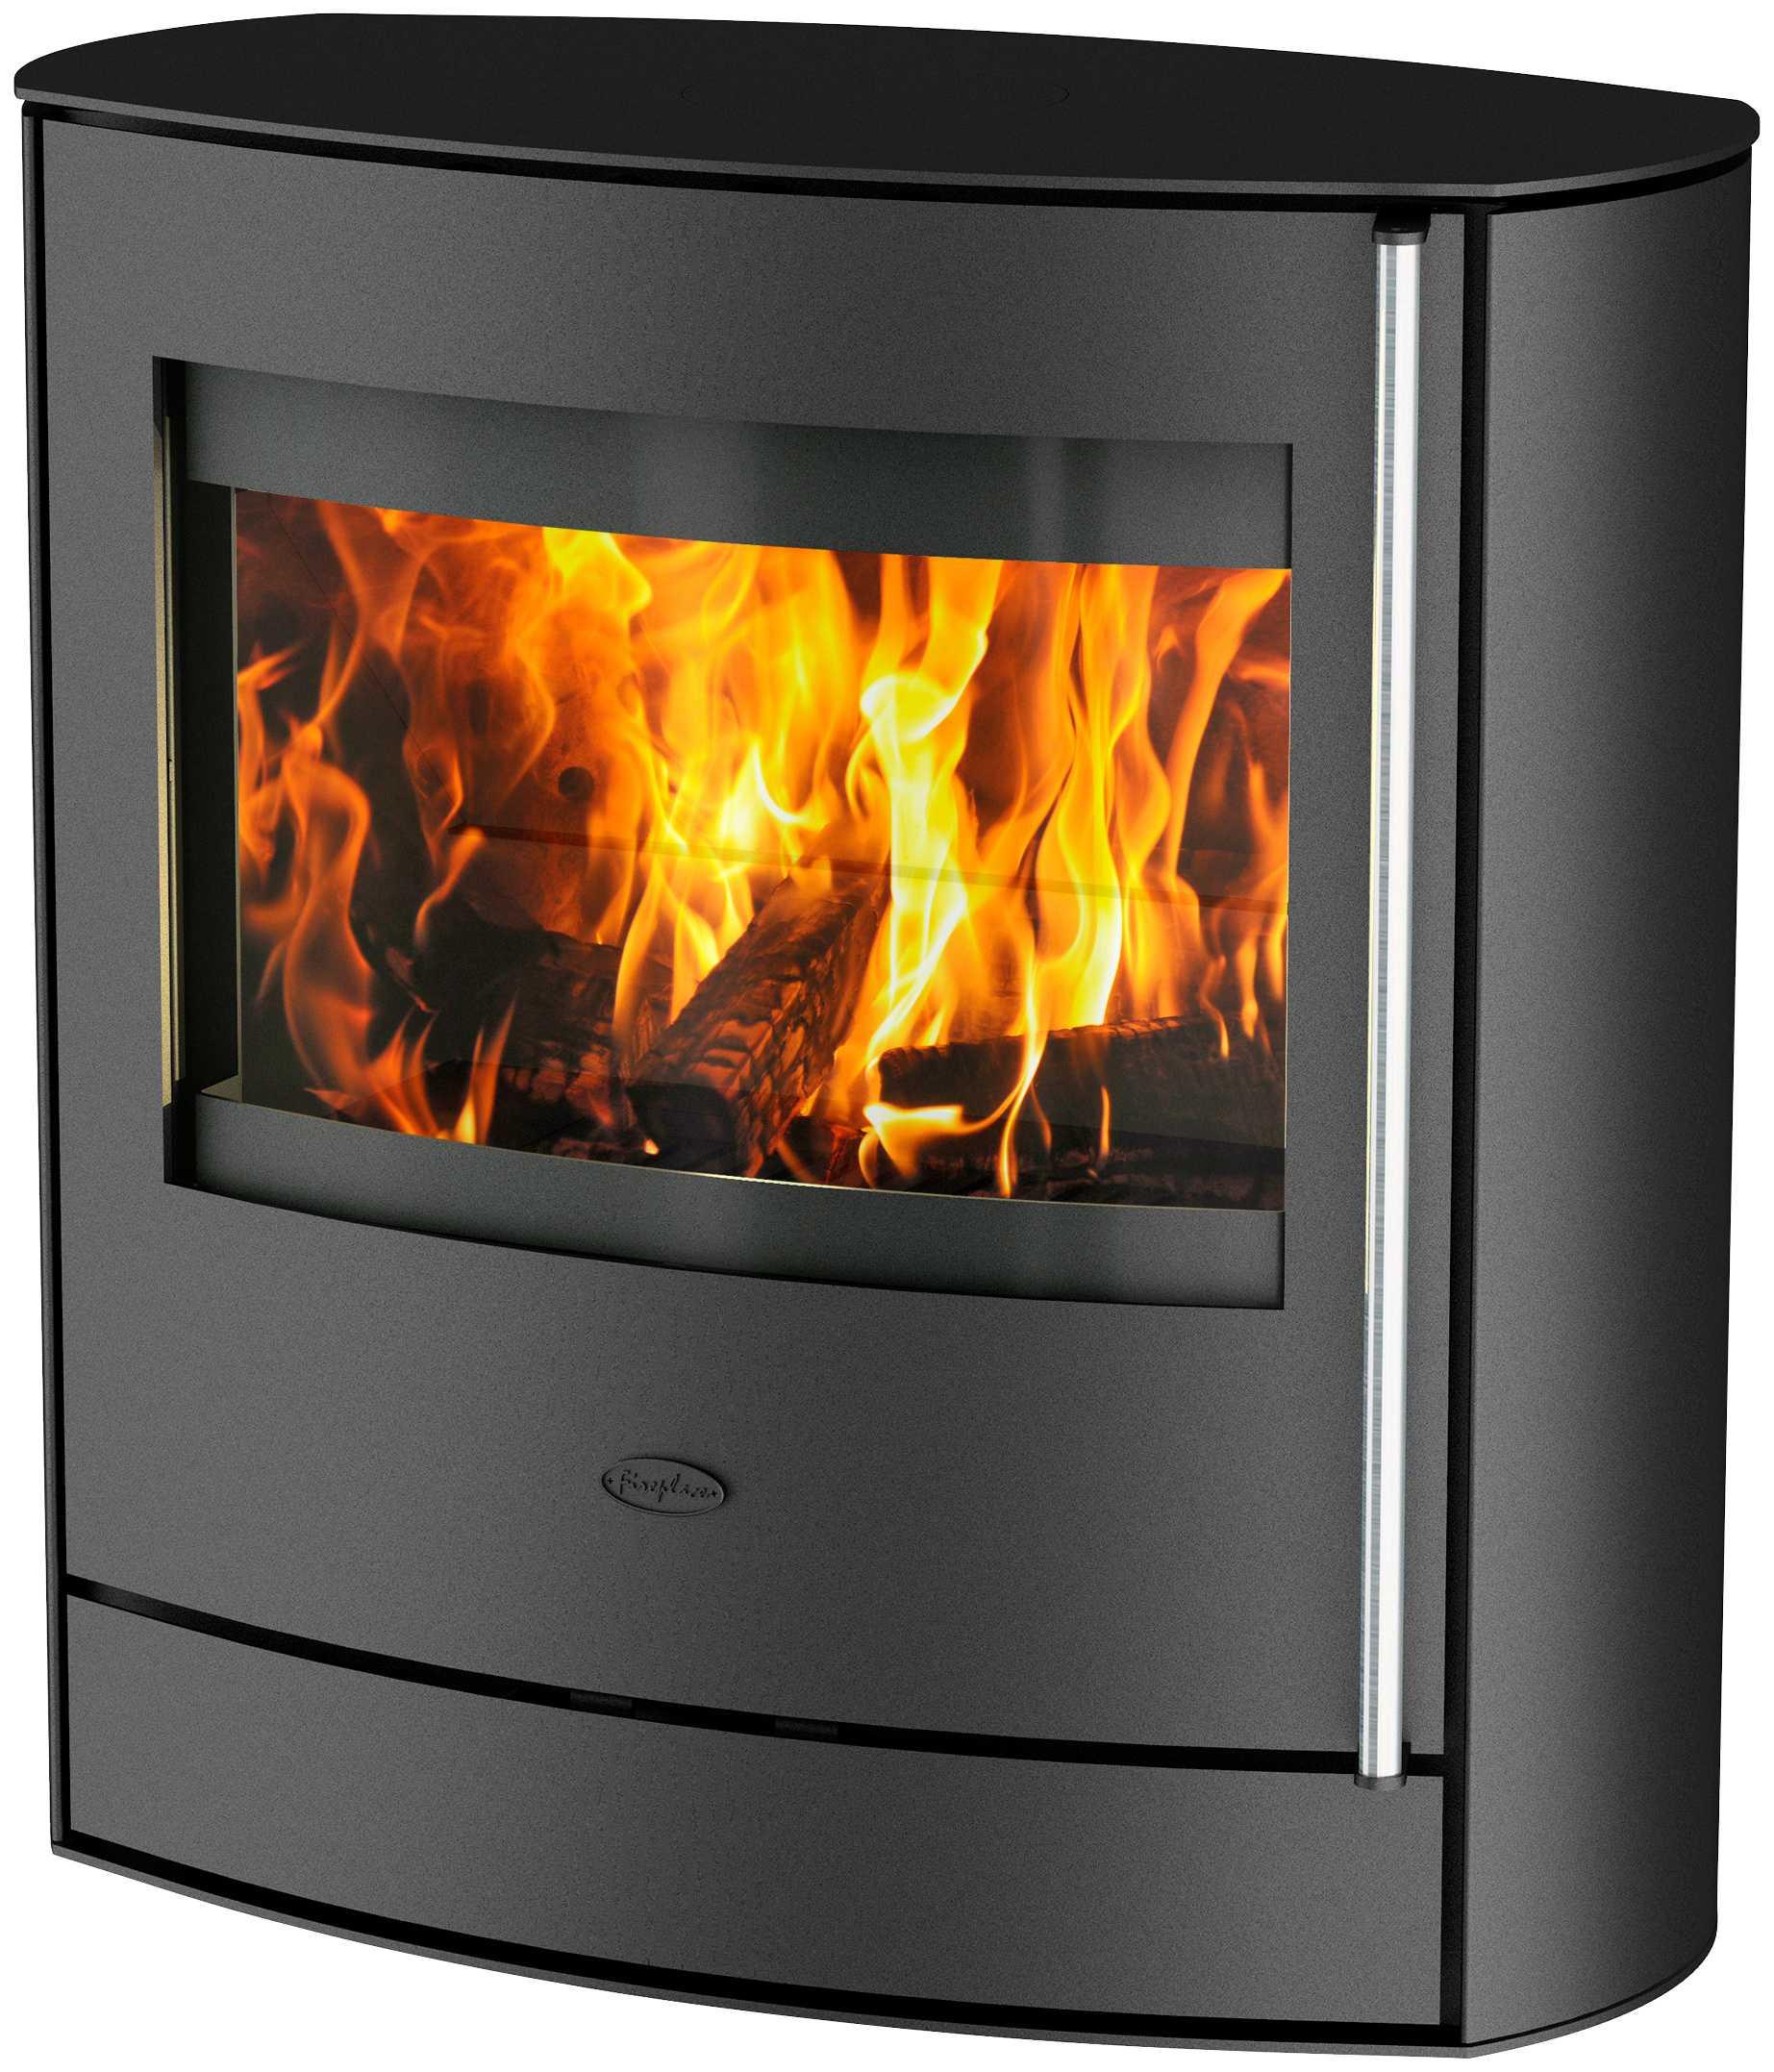 Relativ Fireplace ADAMIS Stahl Kaminofen 7 kW - Ofenbernd.de GQ51